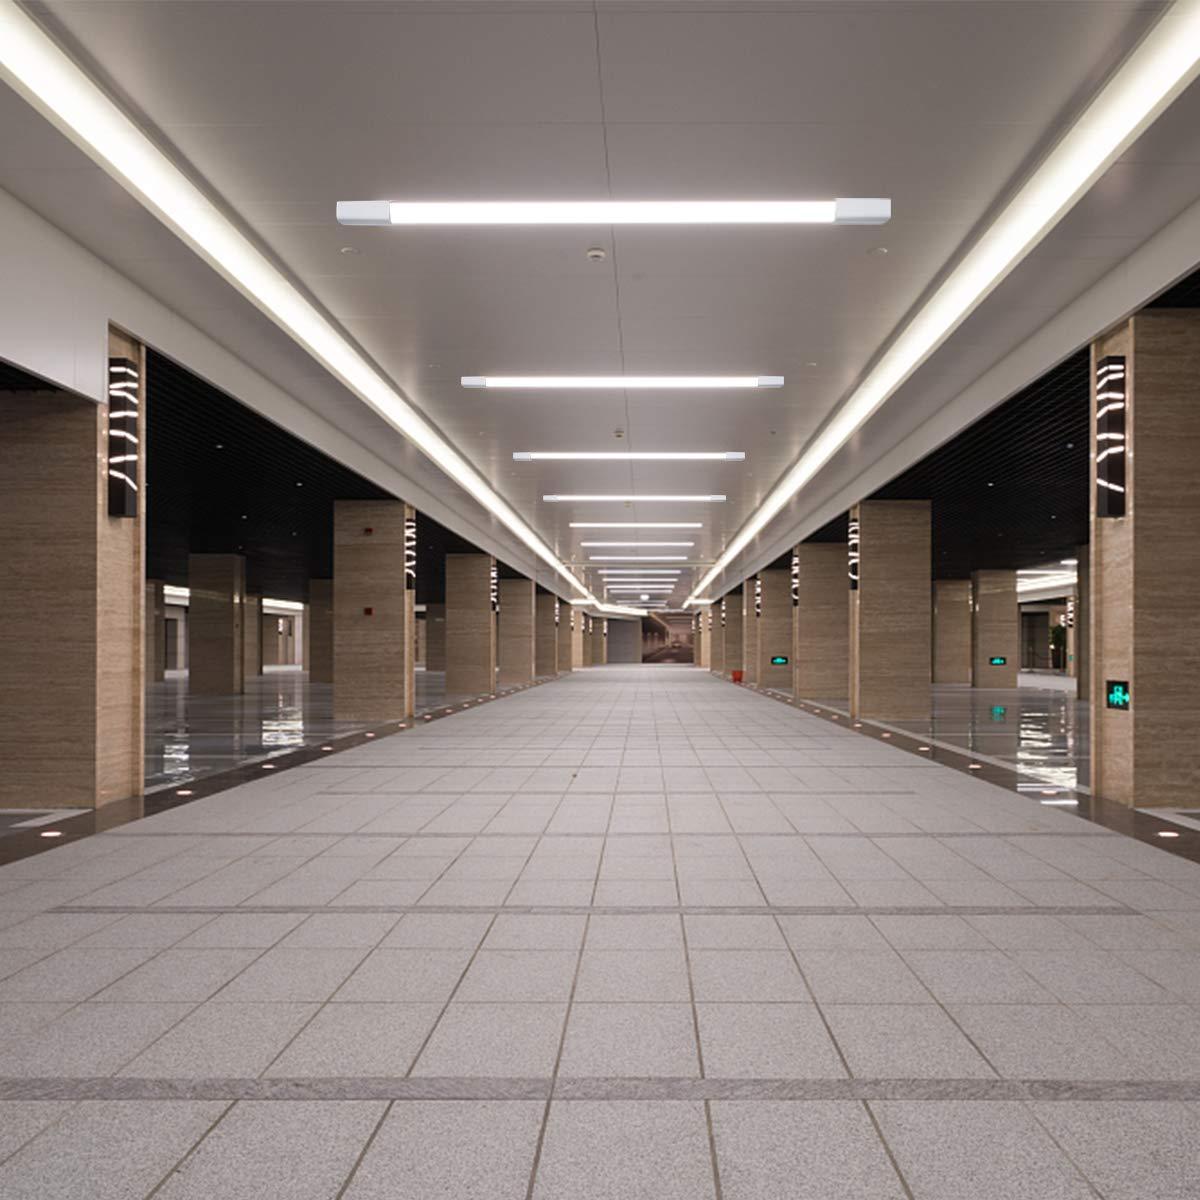 Airand 60CM 18W LED IP66 Luminaire Officina luce 4000LM Plafoniera Bianco Naturale Tubo Lampada Impermeabile Luce per Garage Ufficio Supermercato Cantina Officina Bagno Cucina Plafoniera da Officina